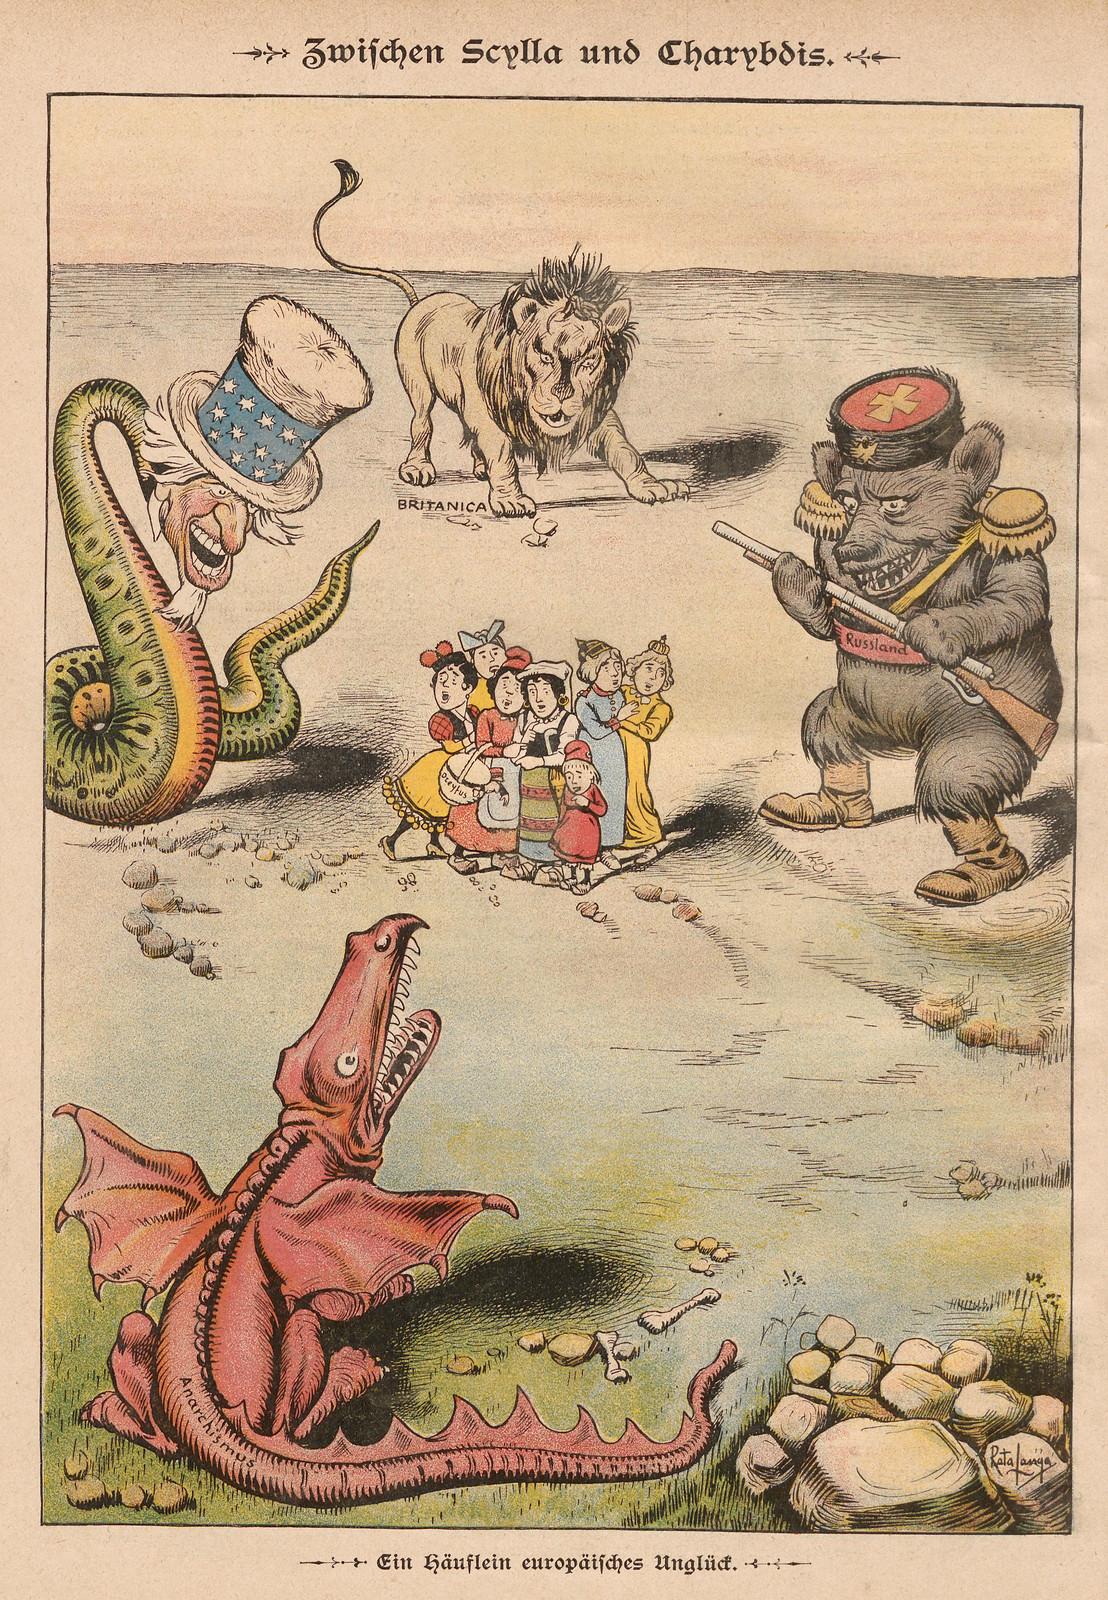 Rata Langa - Between Scylla and Charybdis, 1899